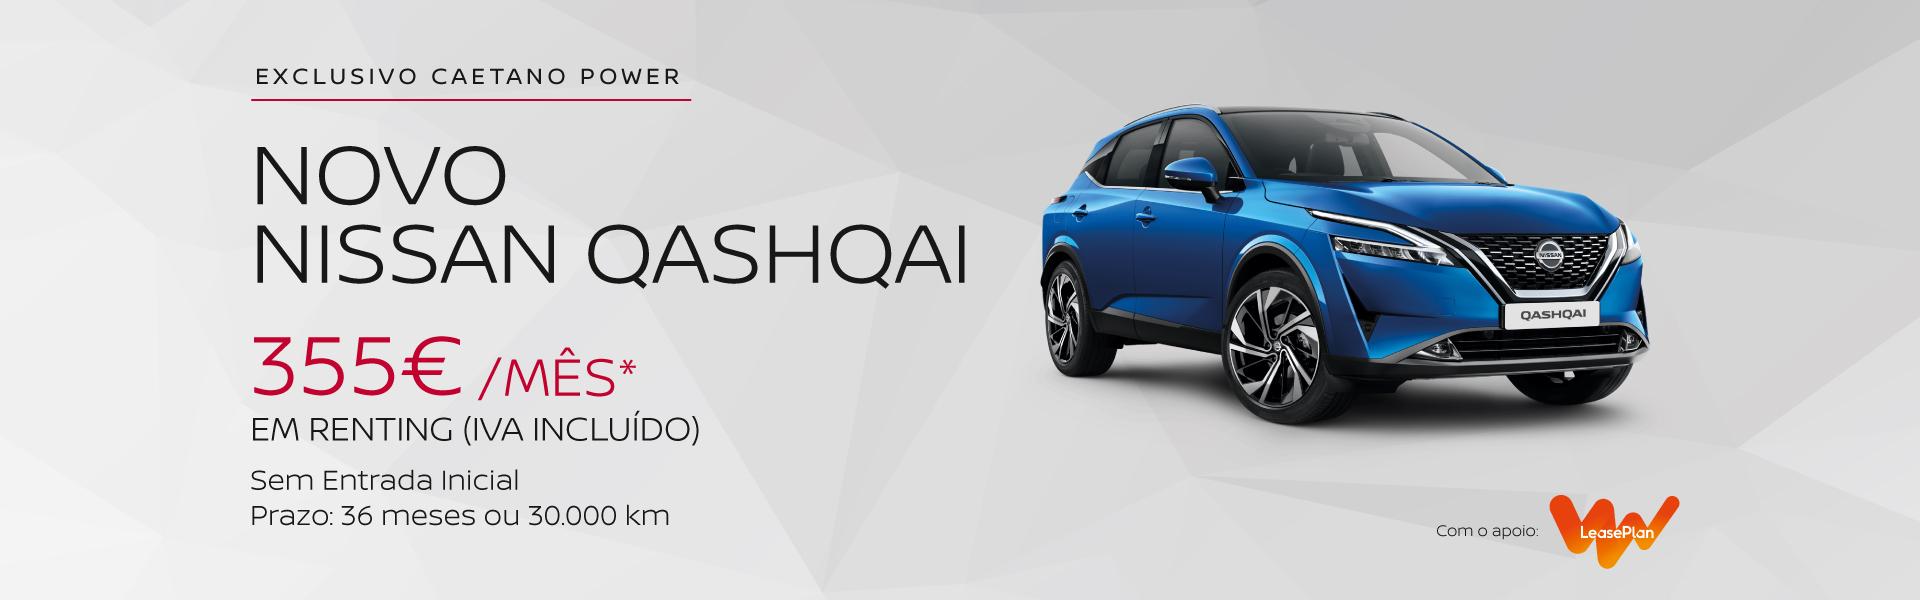 Novo Nissan Qashqai em renting